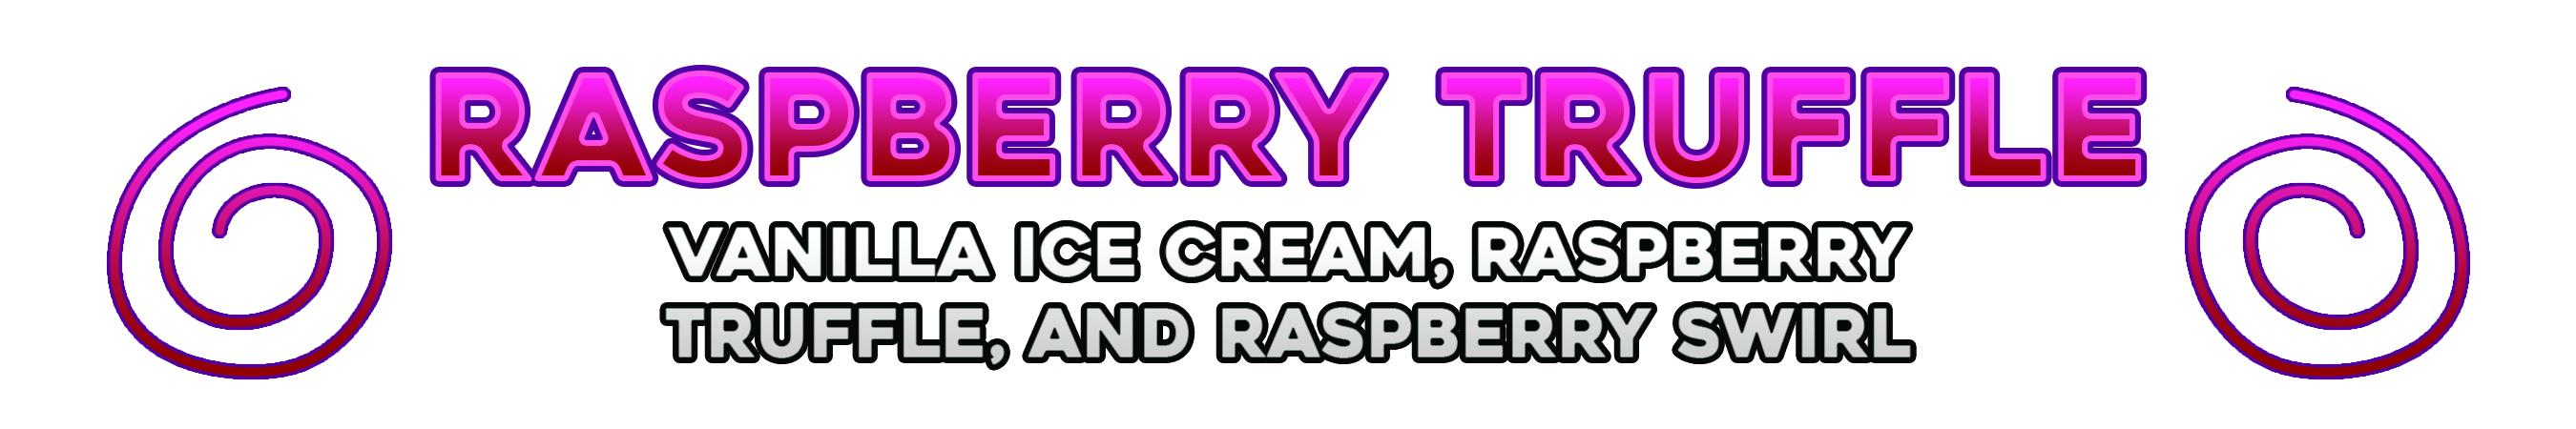 RaspberryTruffle